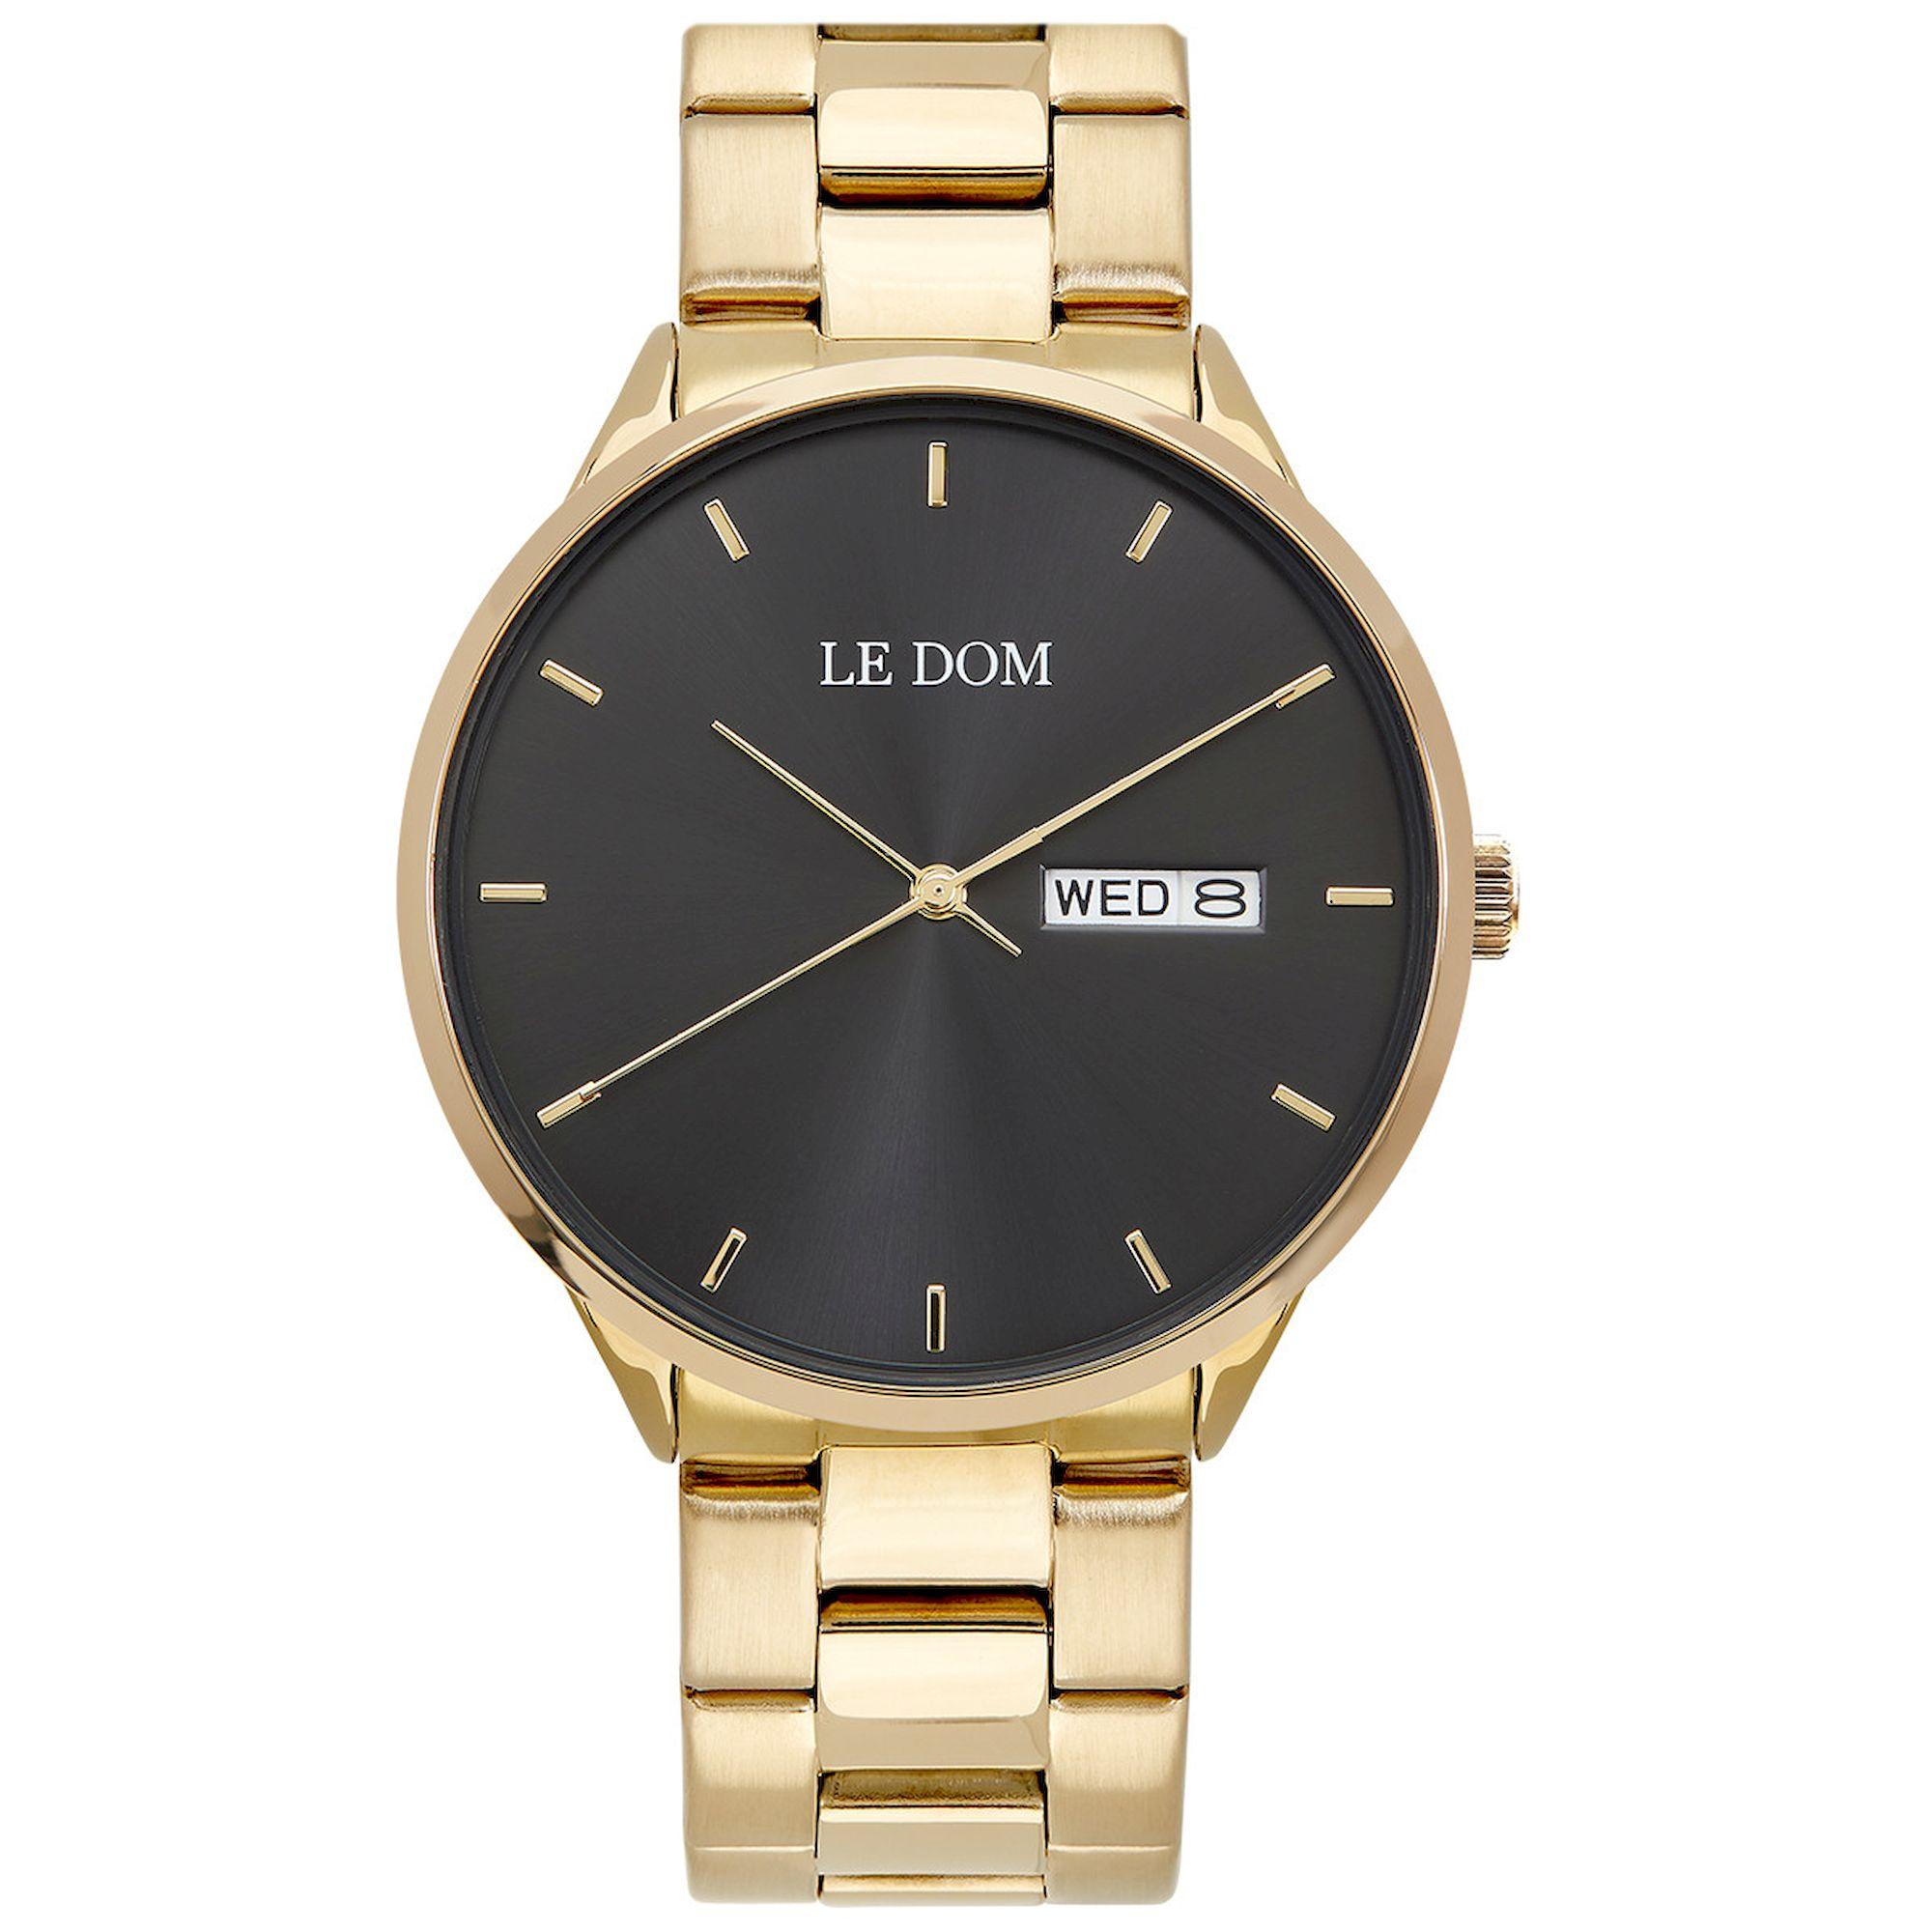 Le Dom Maxim Gold Bracelet LD.1435-3, le dom, ανδρικό ρολόι, ρολόγια, Δωρεάν έξοδα αποστολής, Άμεση ΔΙαθεσιμότητα, Le Dom Ρολόγια